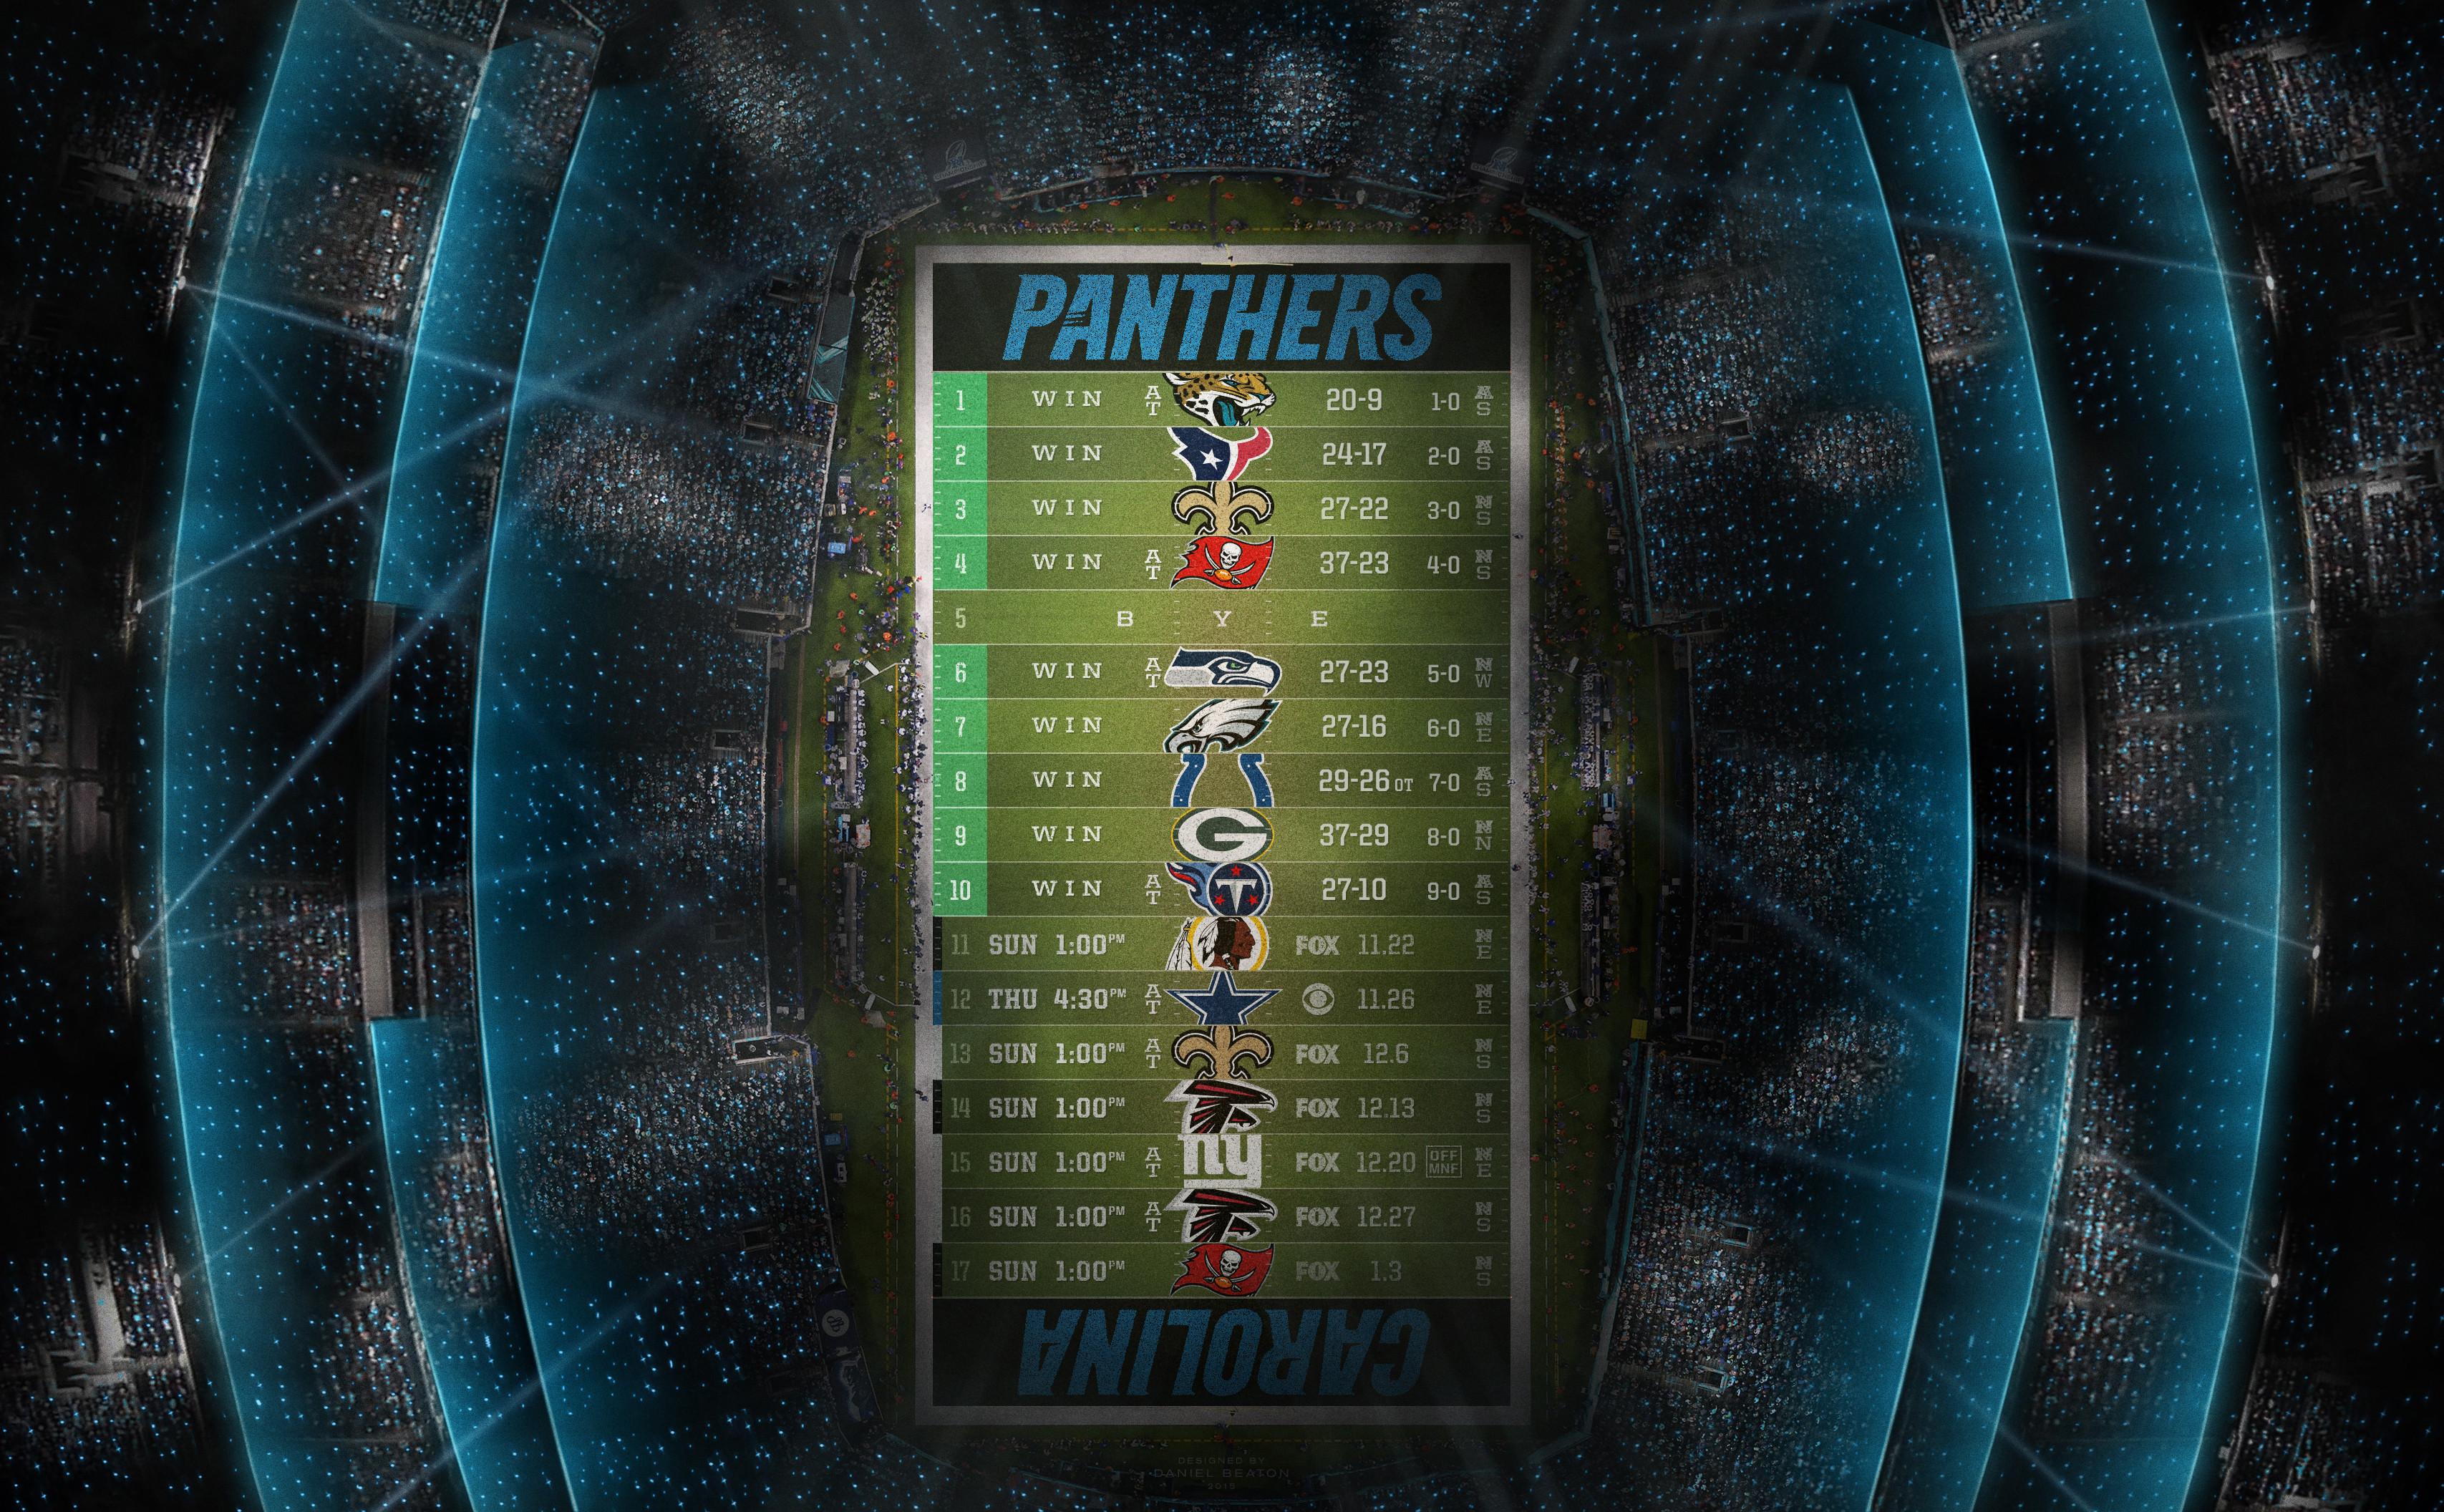 Res: 3414x2112, Updated stadium schedule wallpaper (9-0!)